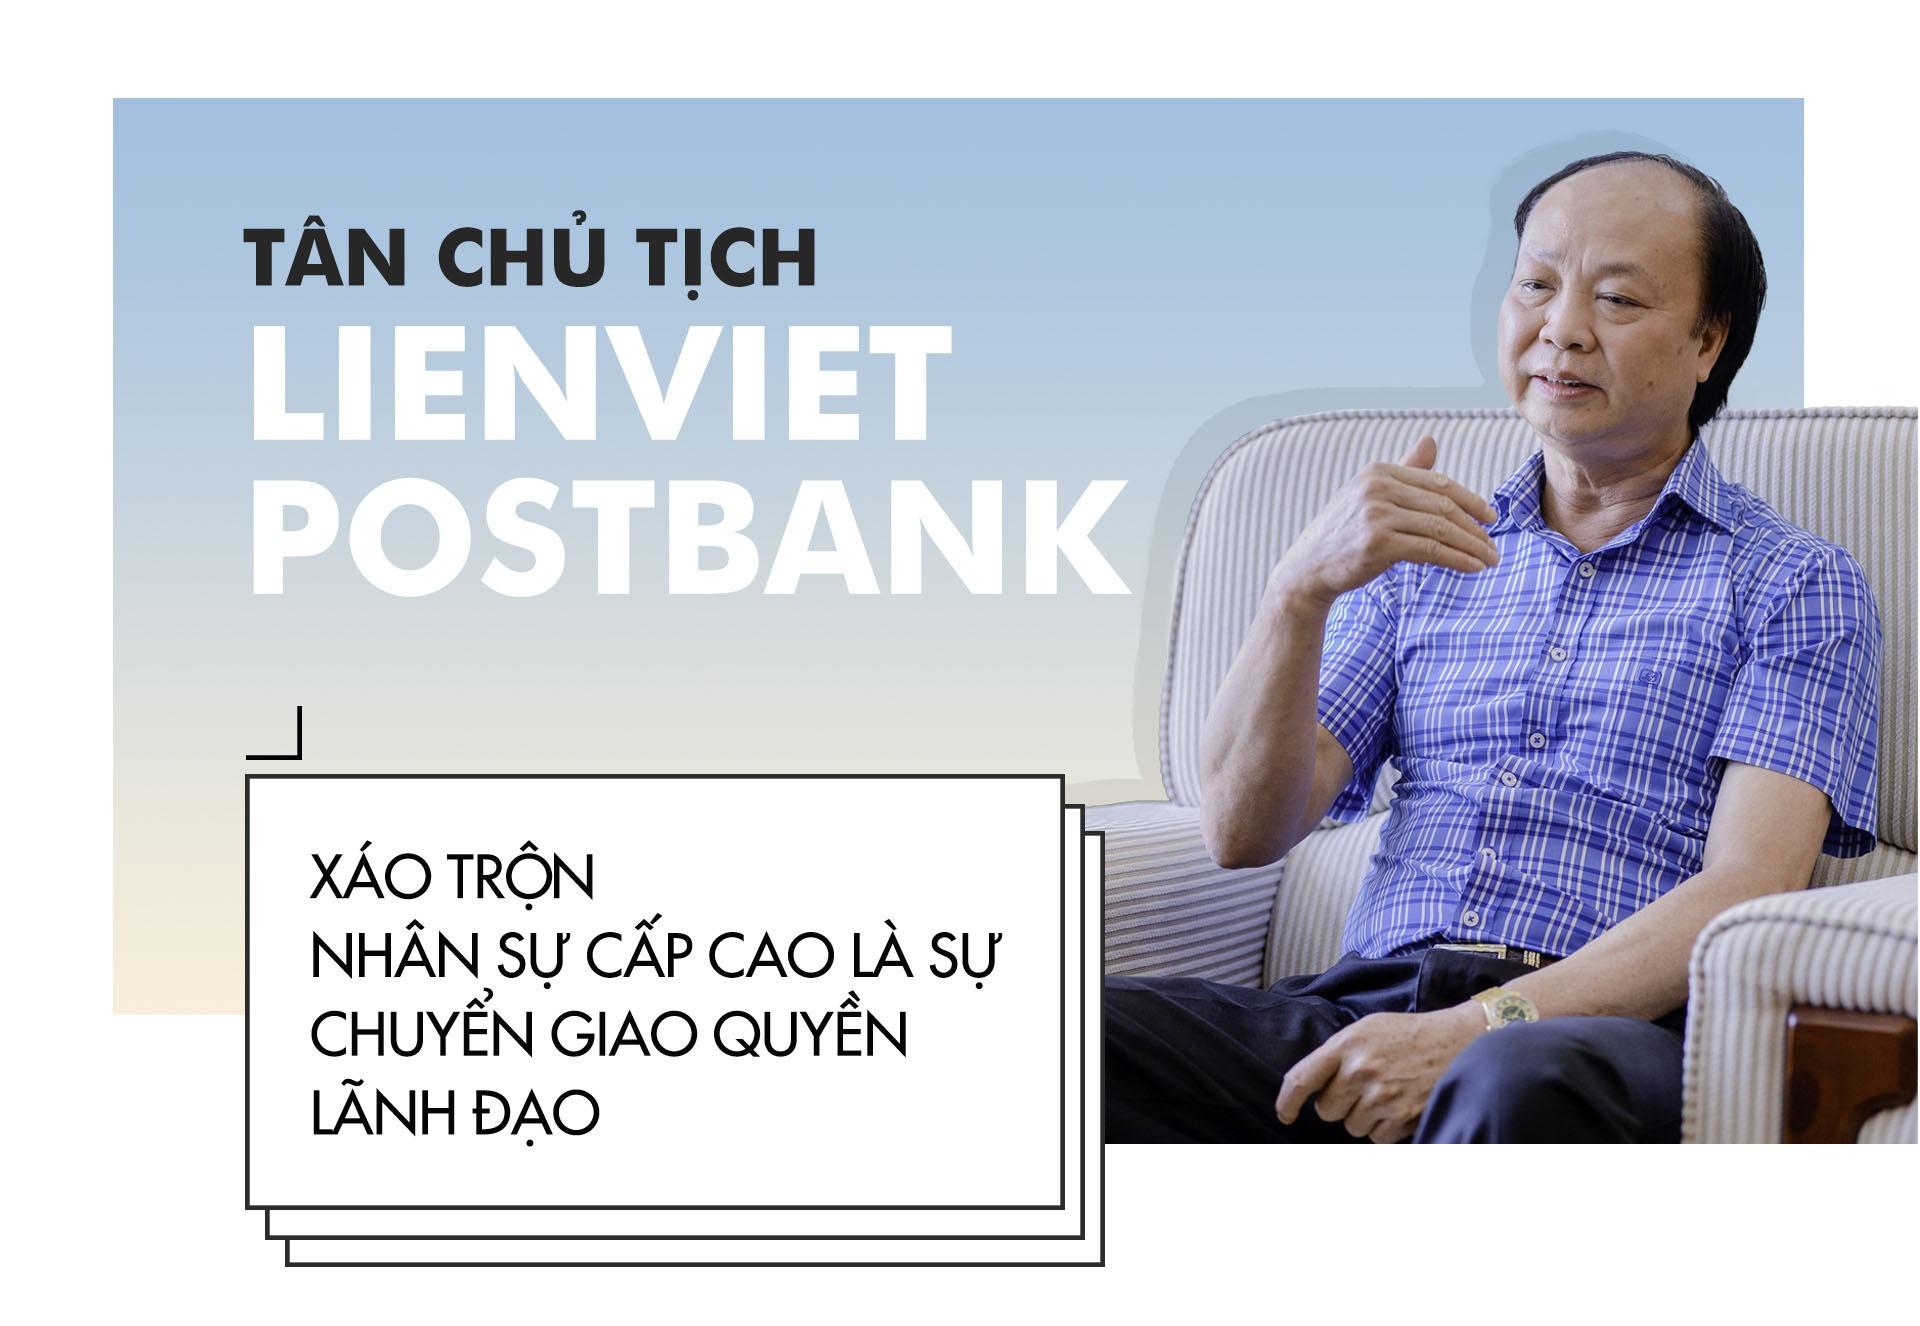 Tan chu tich LienVietPostBank: 'Ve gia toi van khoi nghiep cung nen' hinh anh 2